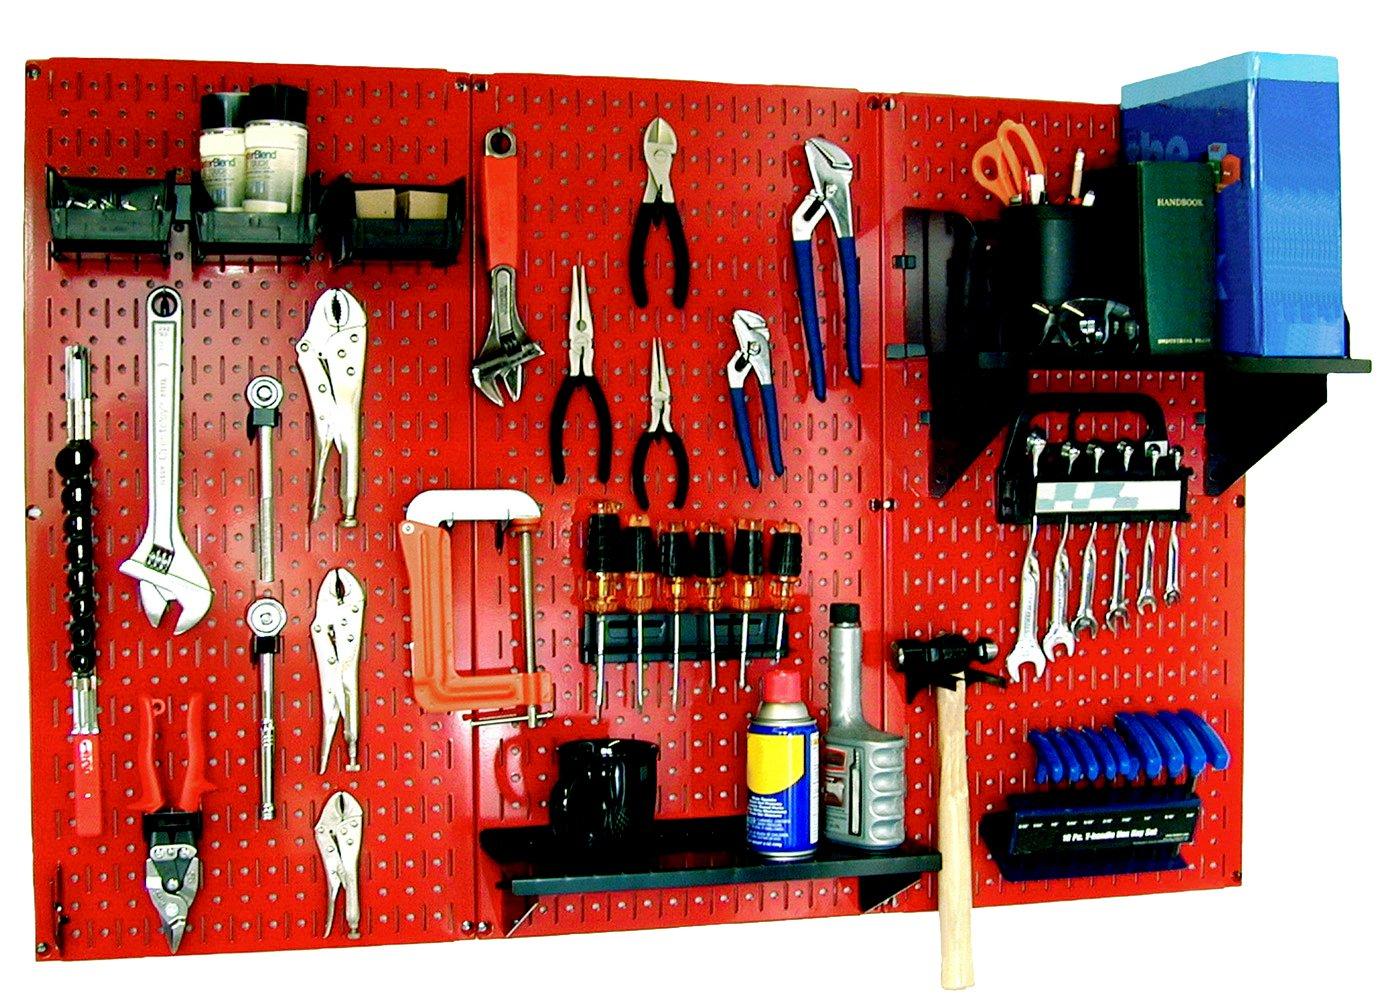 Wall Control 30-WRK-400RB Standard Workbench Metal Pegboard Tool Organizer